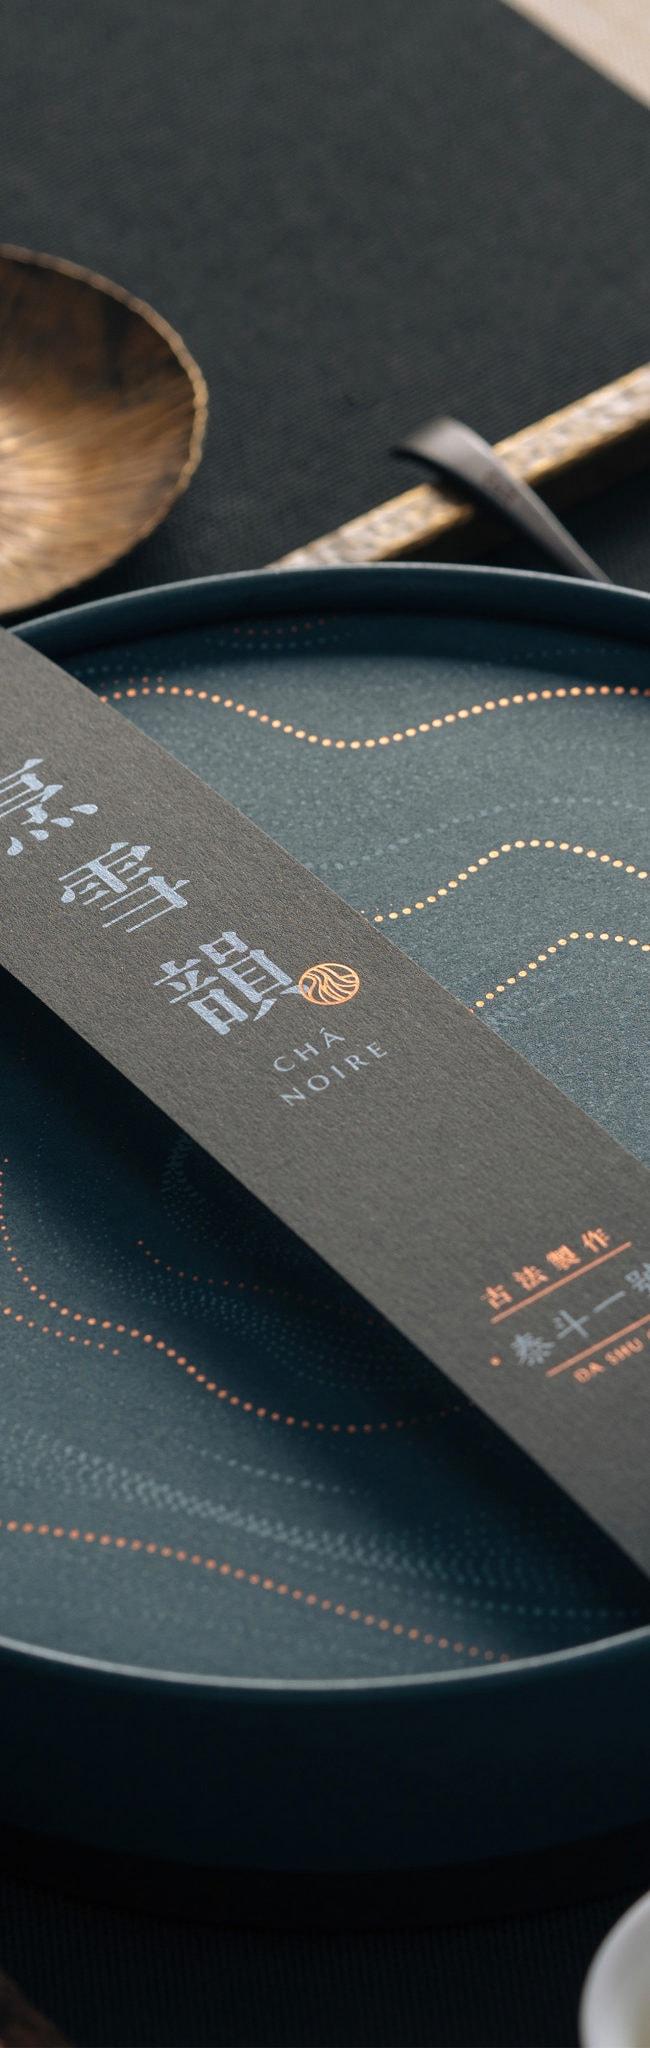 烹雪韻 CHÁ NOIRE Package Design 2